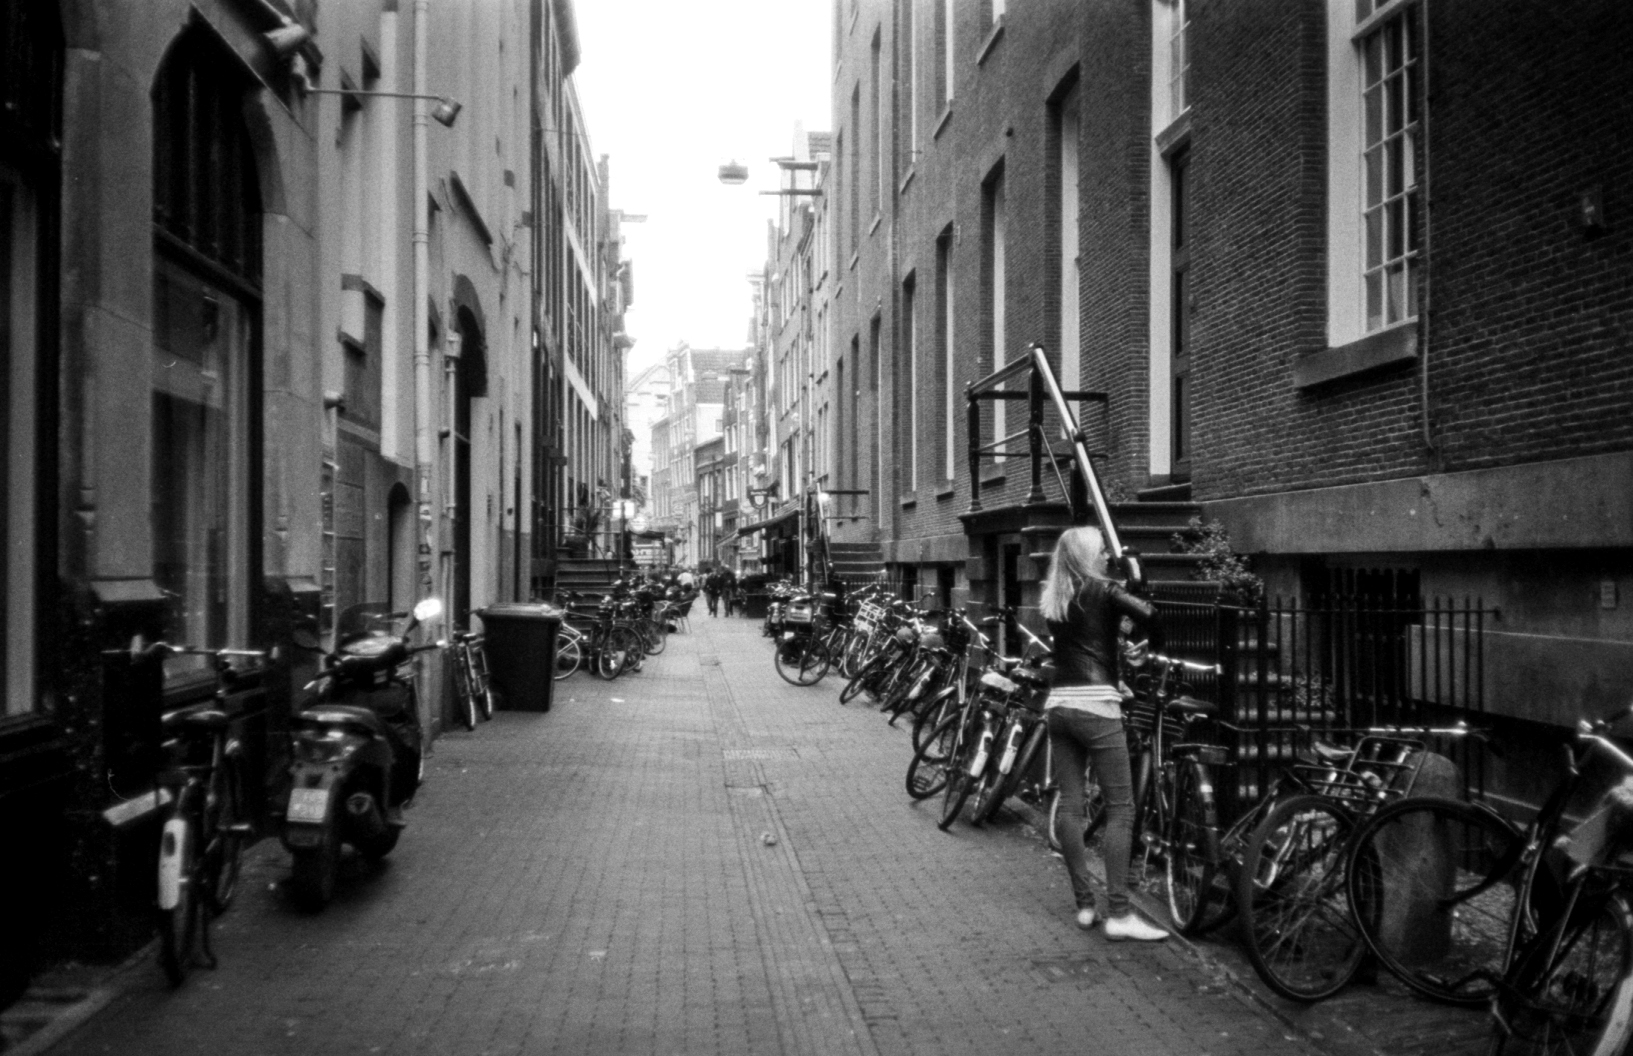 Amsterdam, The Netherlands. April 2014.